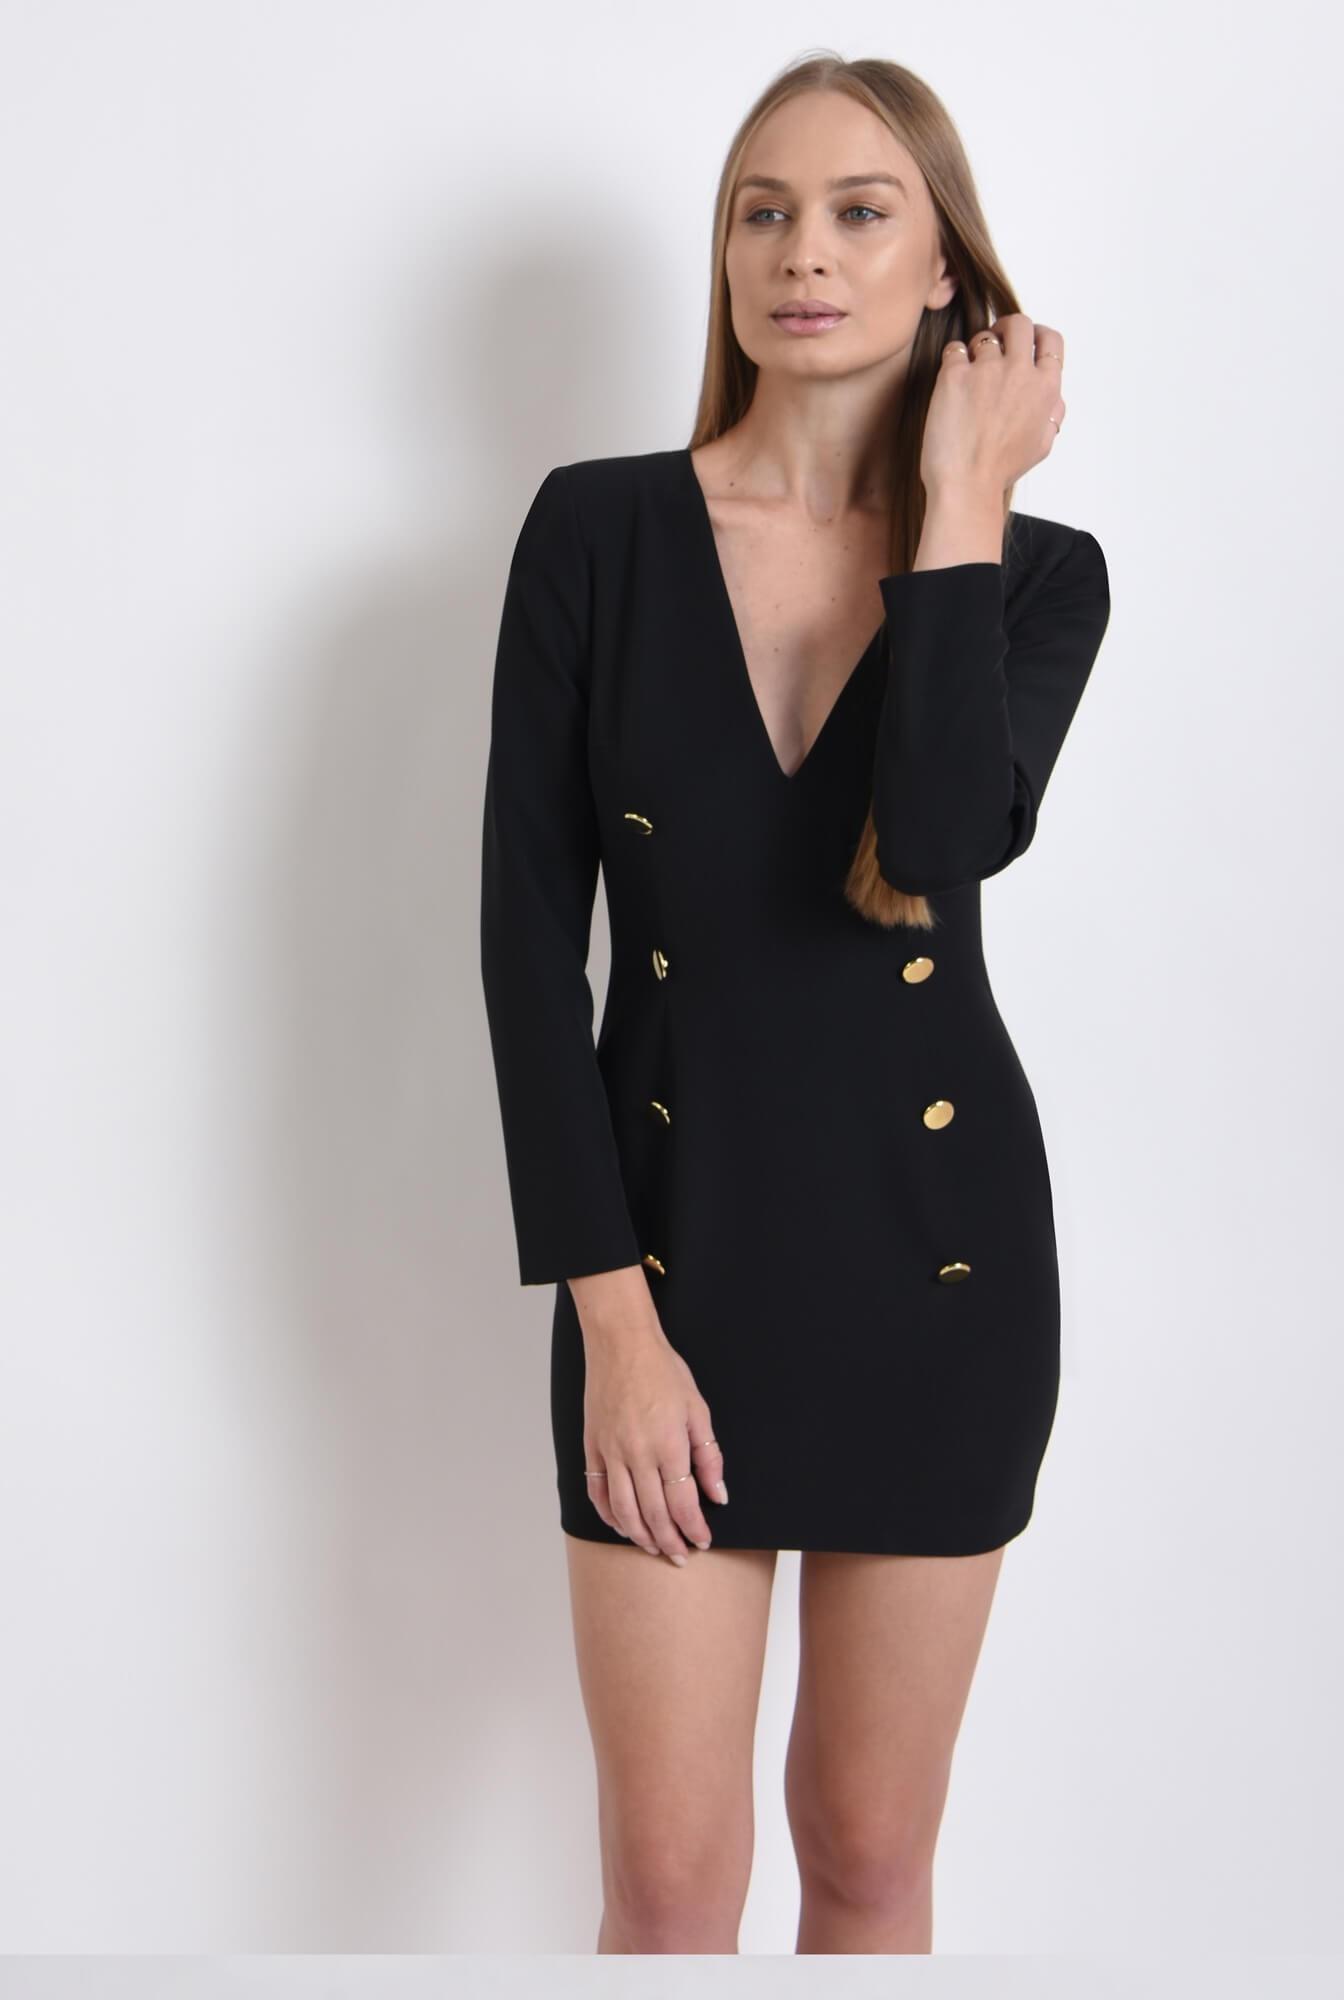 0 - rochie casual, neagra, cu nasturi multipli